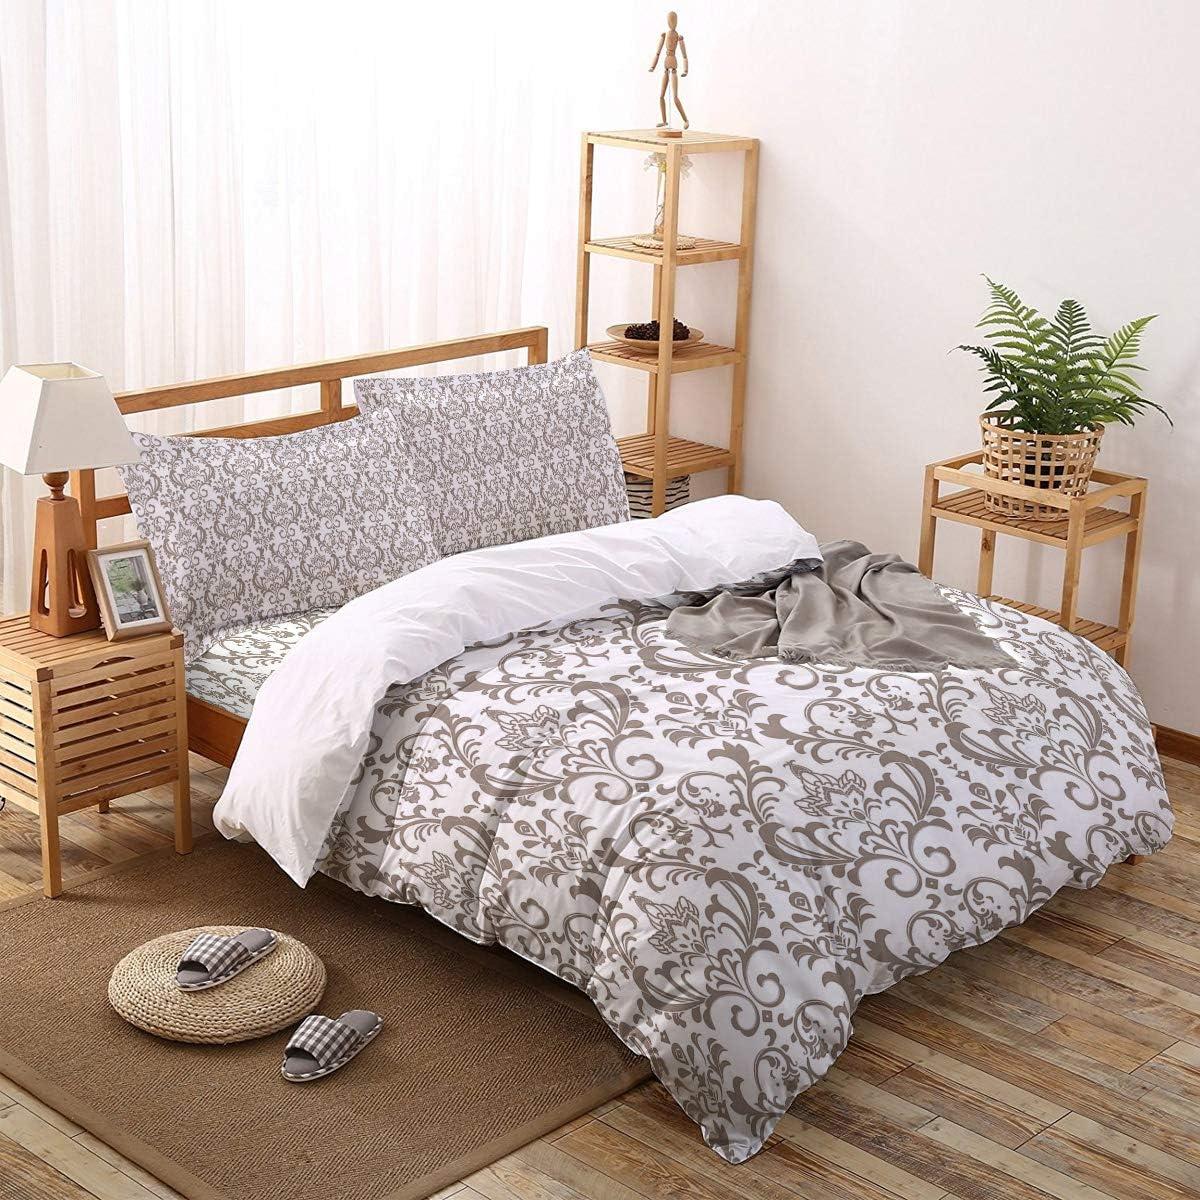 Greeeen 4 San Jose Mall Pieces Duvet Cover Translated Bedding + Set- Flat 1